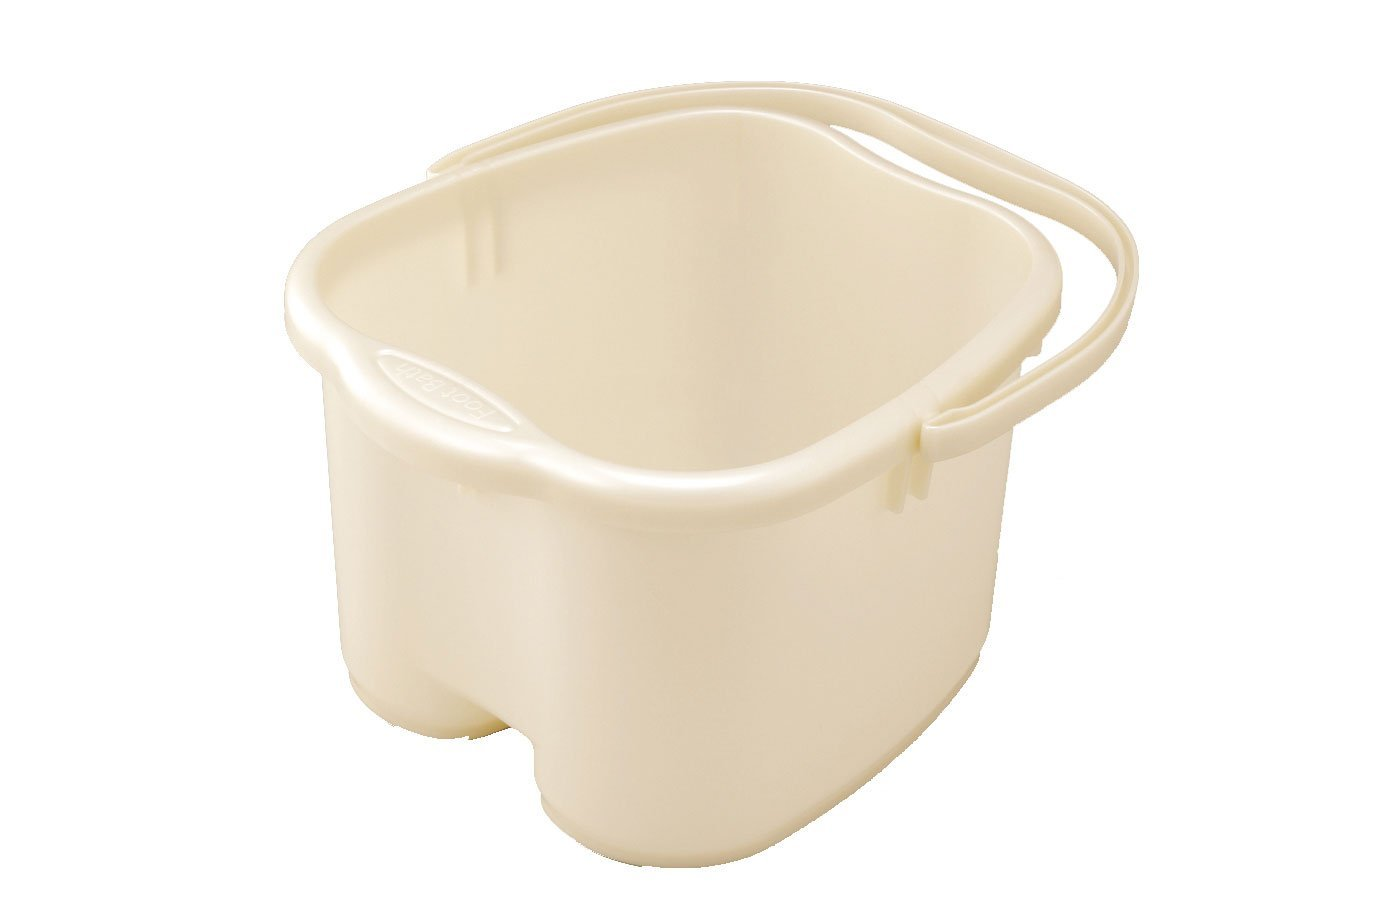 Amazon.com: Inomata Pearl Foot Detox Massage Spa Bucket, White: Home ...